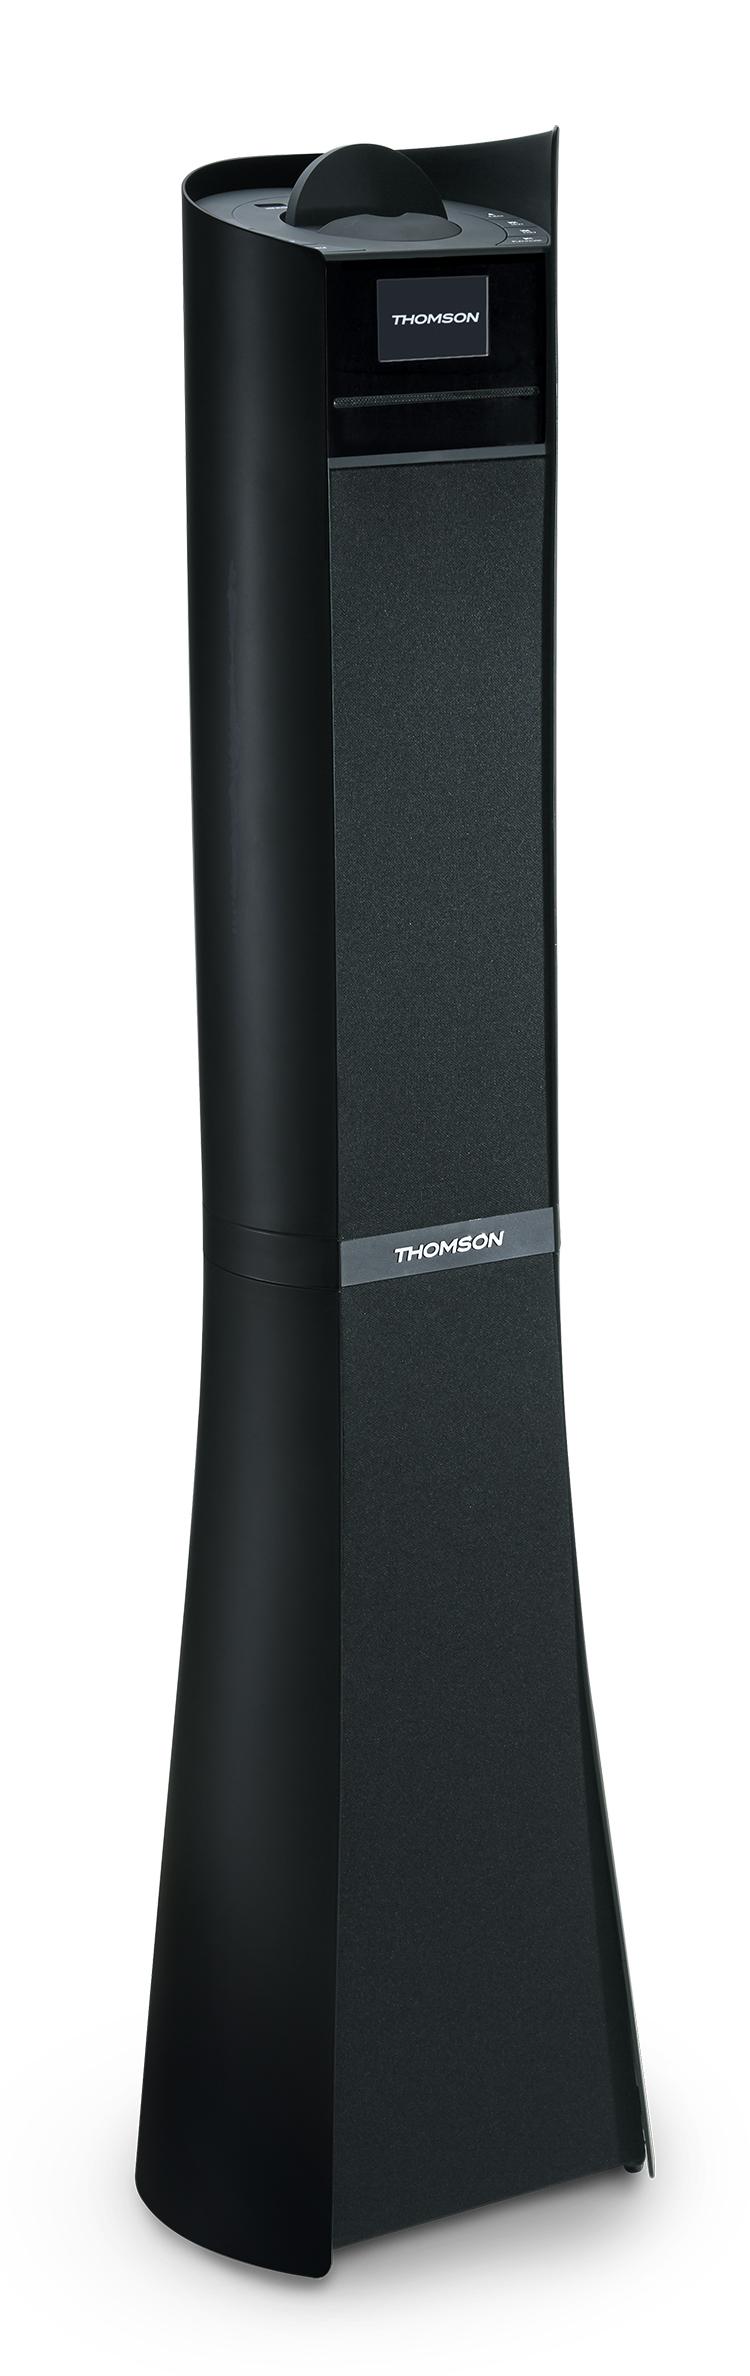 2.1CH Multimedia tower DS500BLACK THOMSON - Immagine